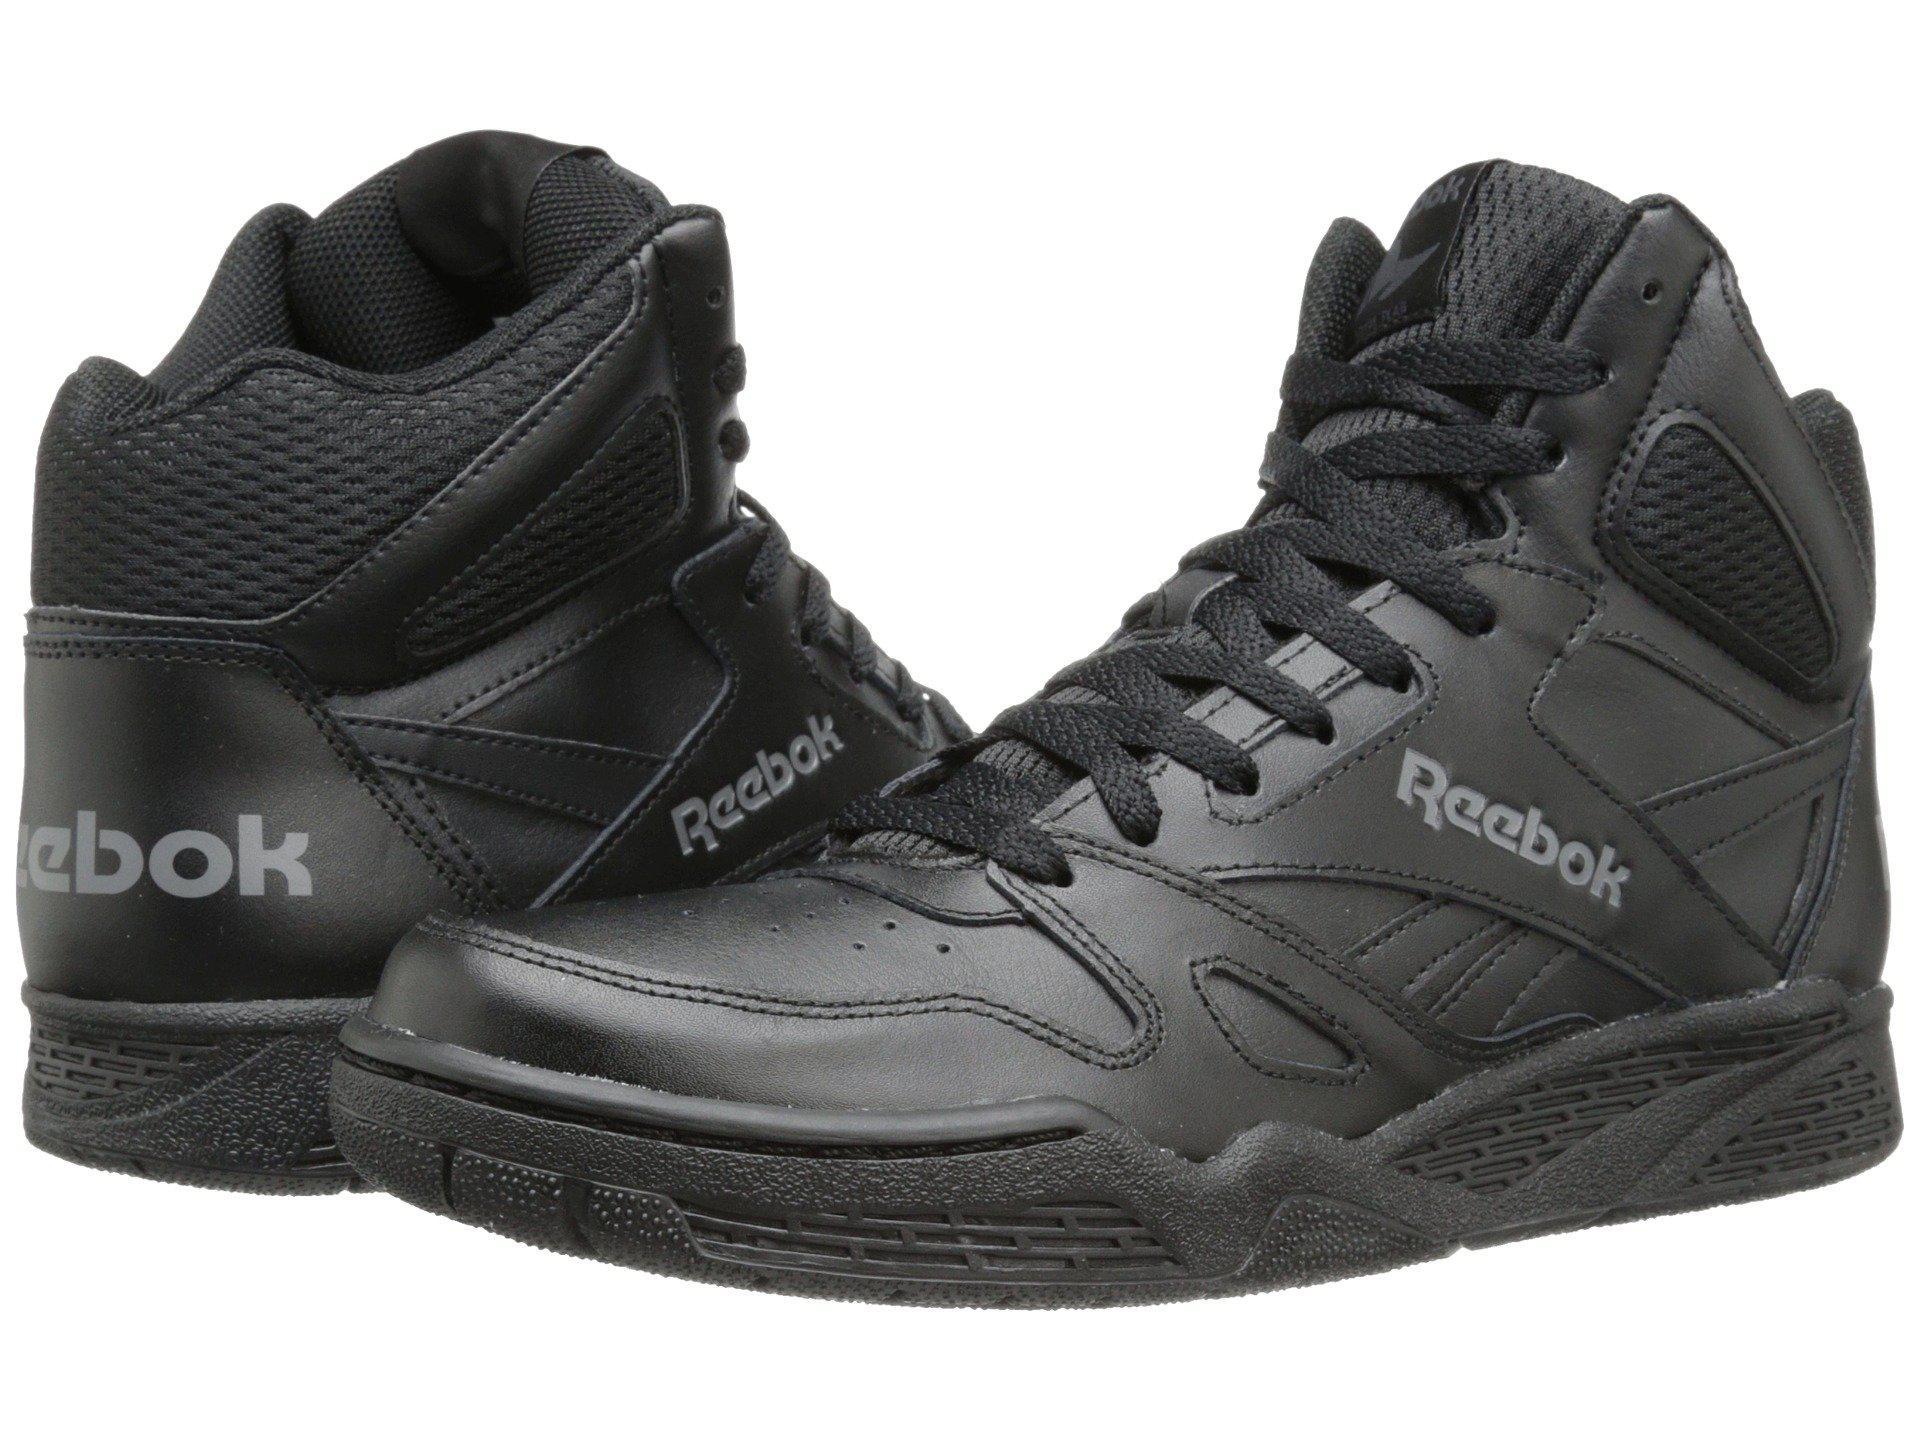 737b6d0edae ... best price reebok black royal bb4500 hi white steel mens basketball  shoes for men. view